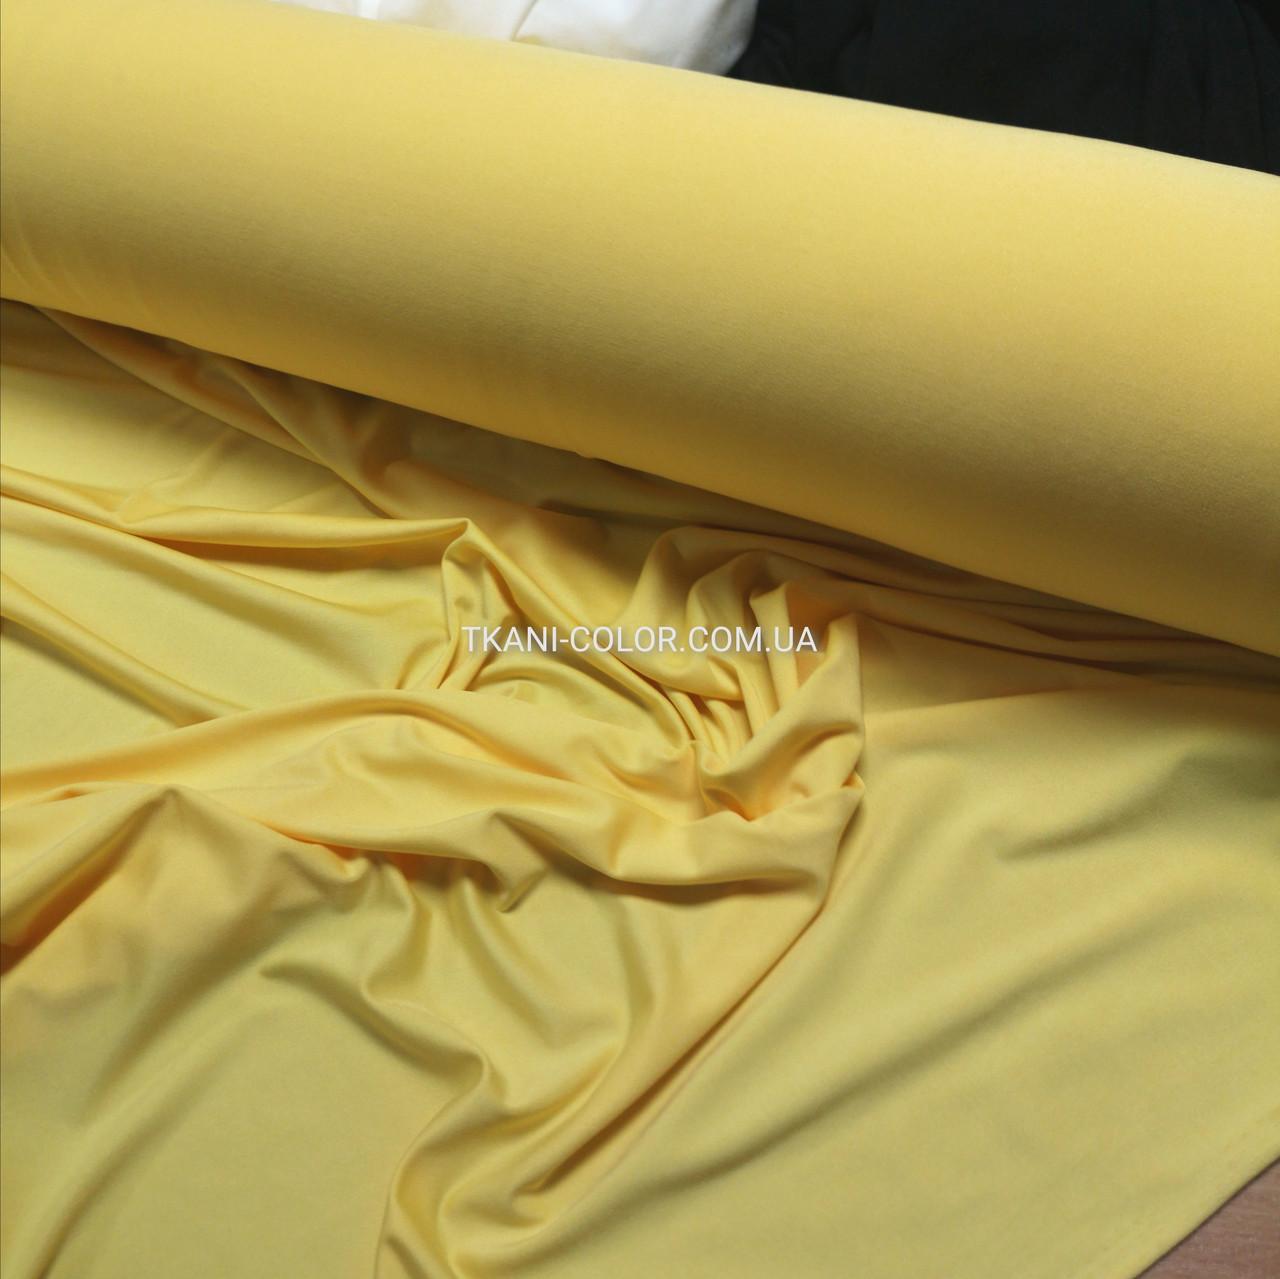 Микромасло трикотаж желтый